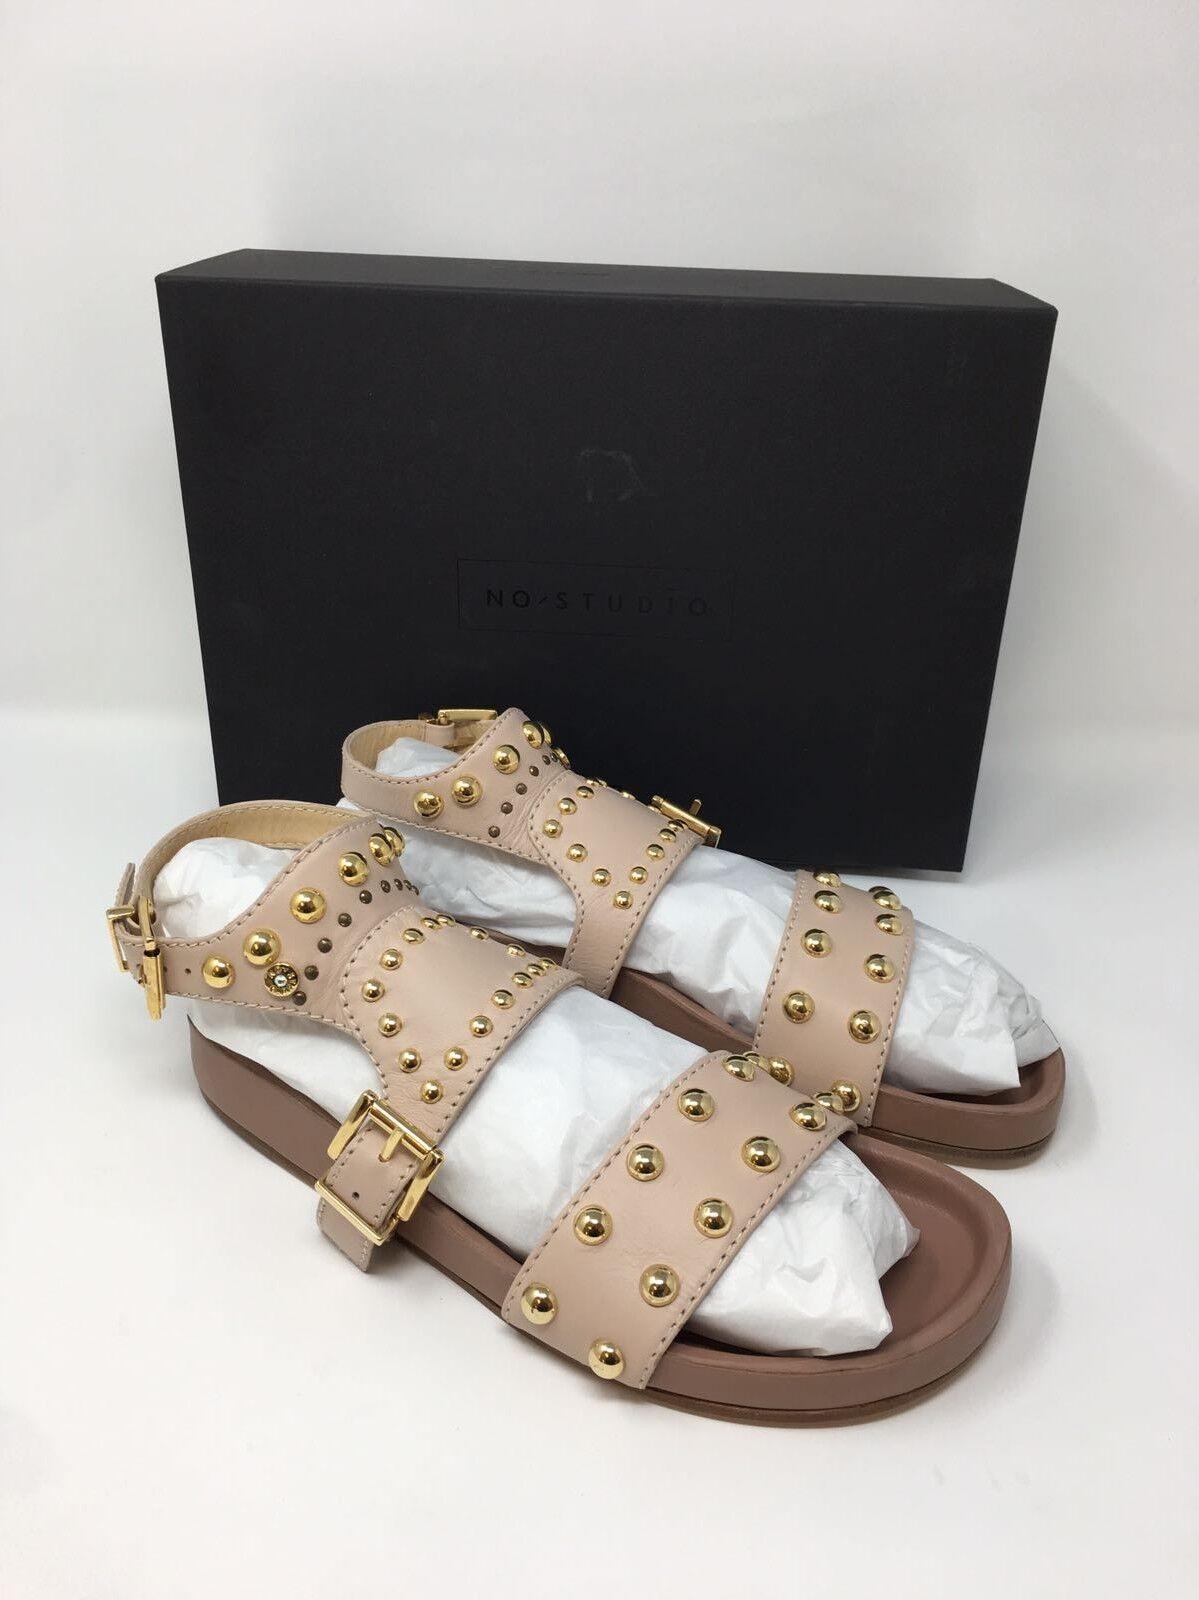 NO STUDIO Zuzu Nude Leather Studded Sandals £250